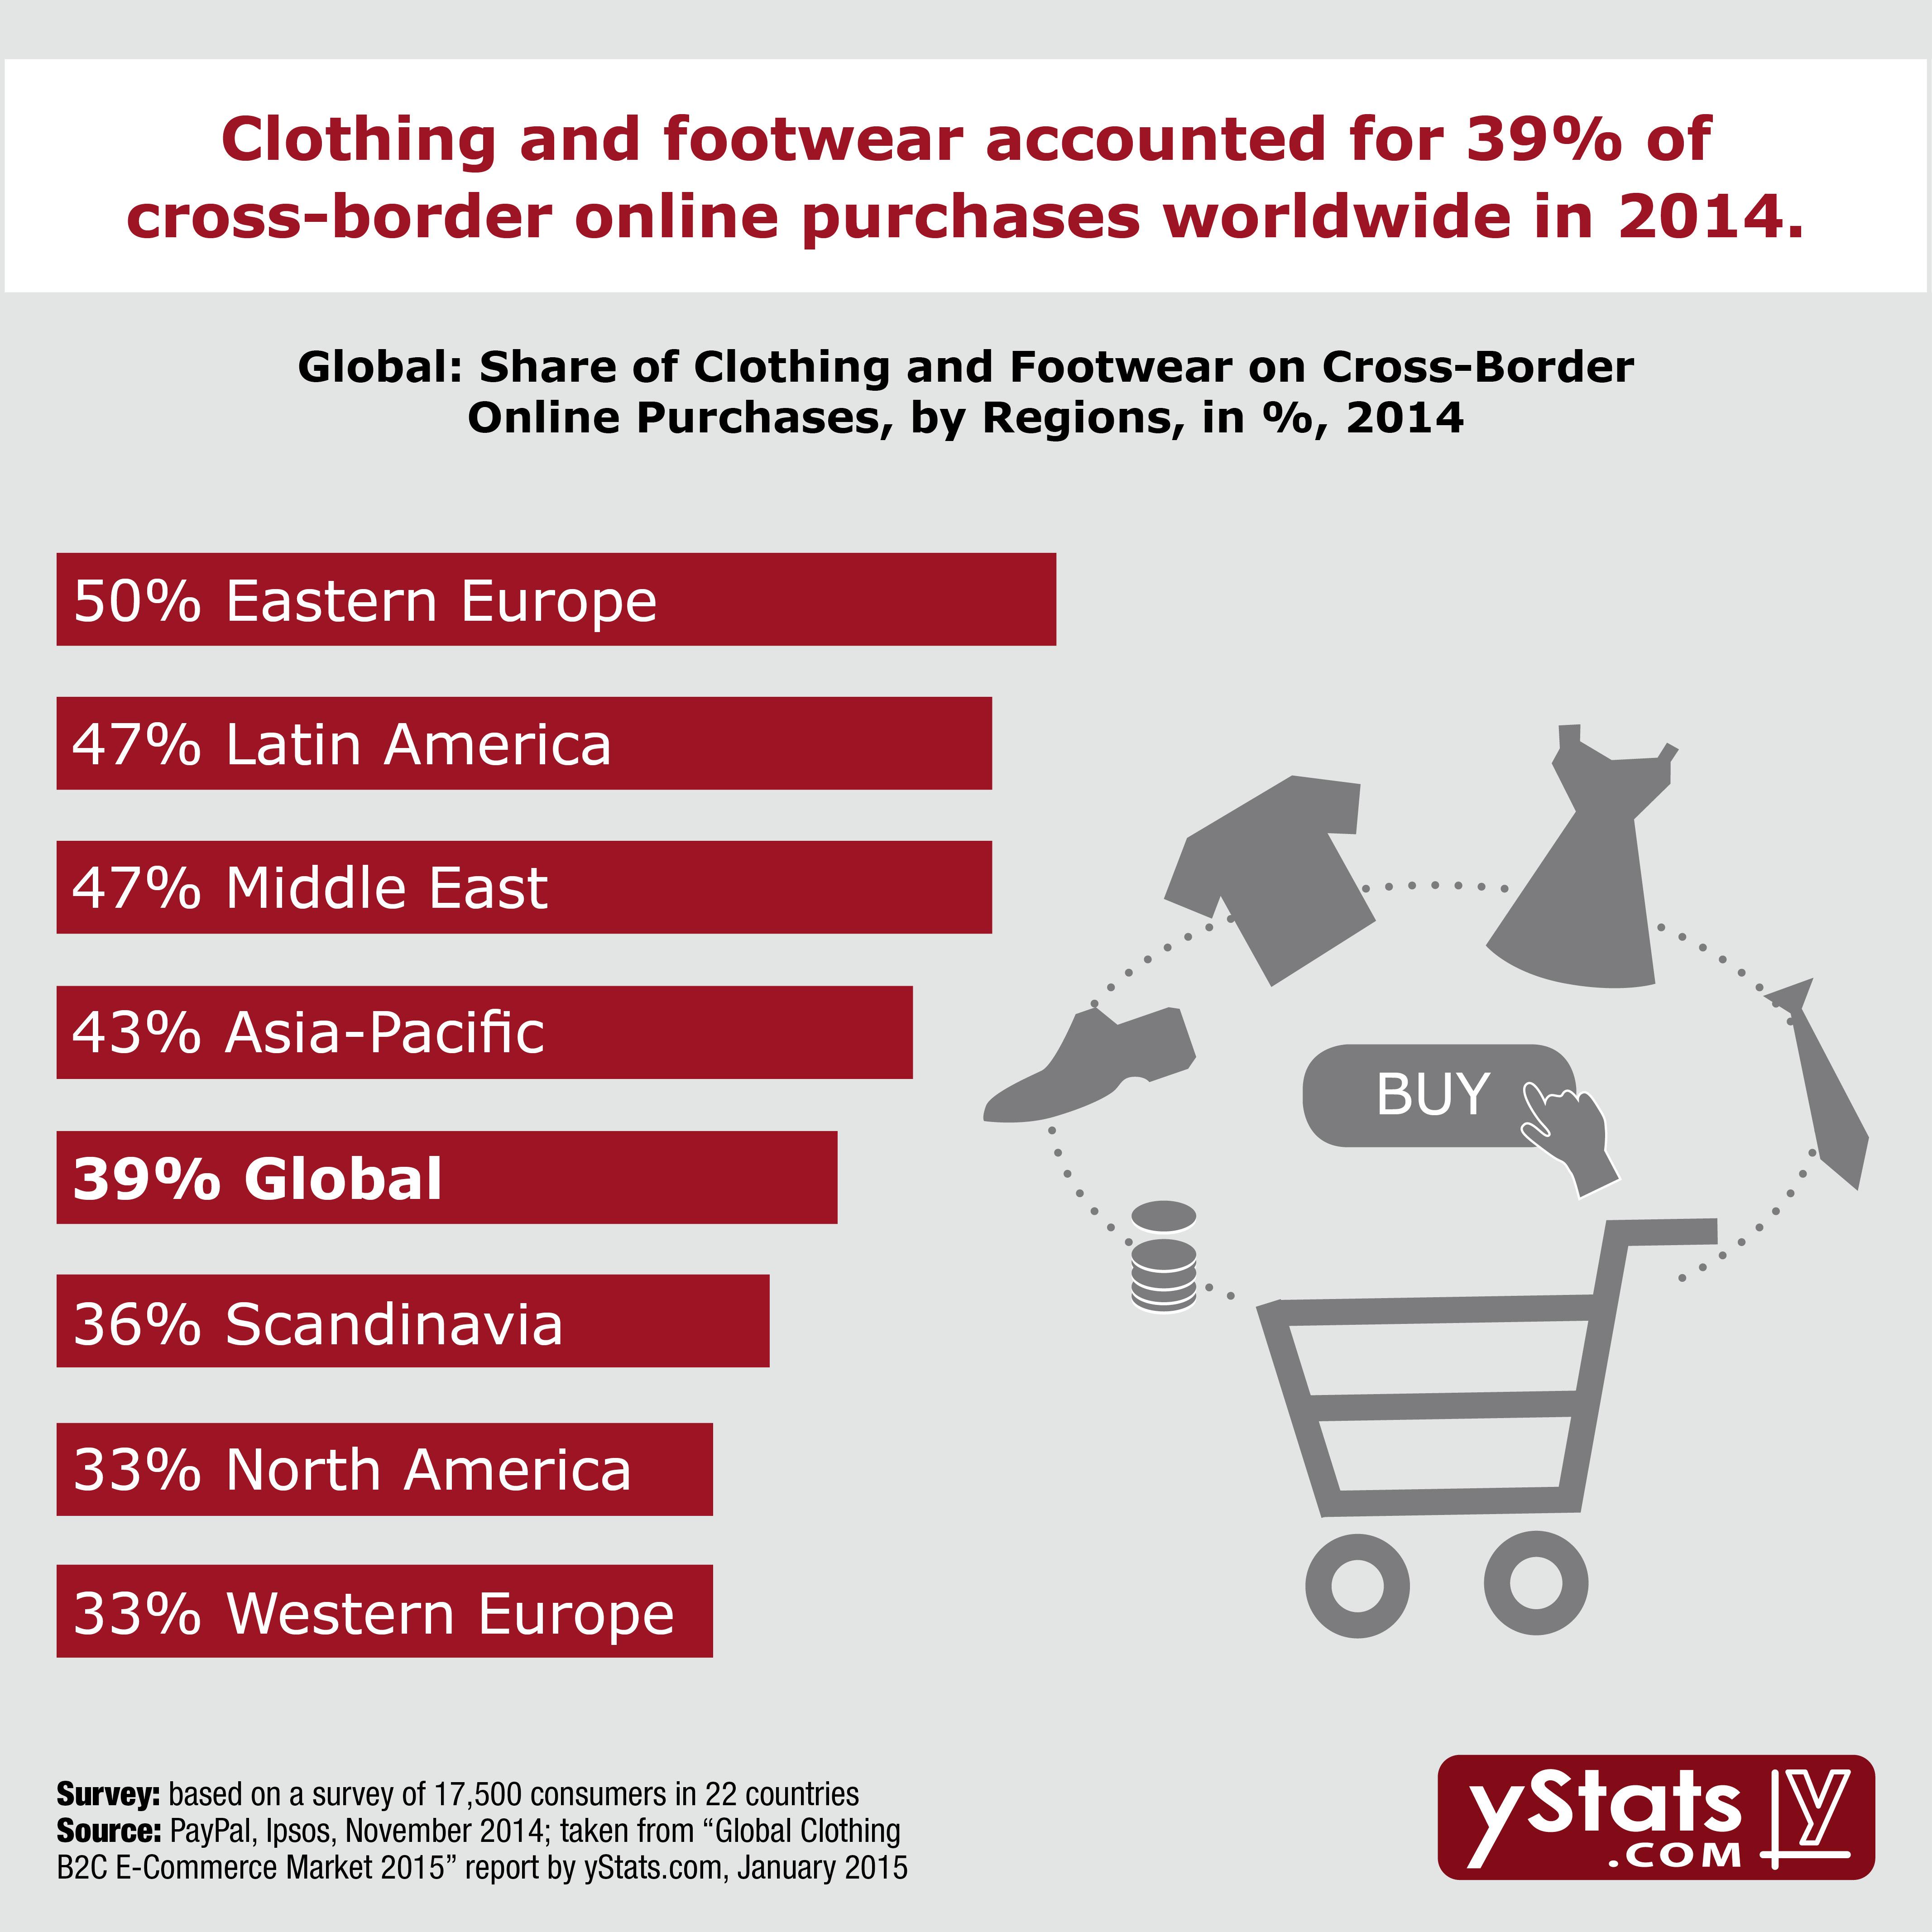 E Commerce Site Map: YStats.com Infographic Global Clothing B2C E-Commerce Market 2015